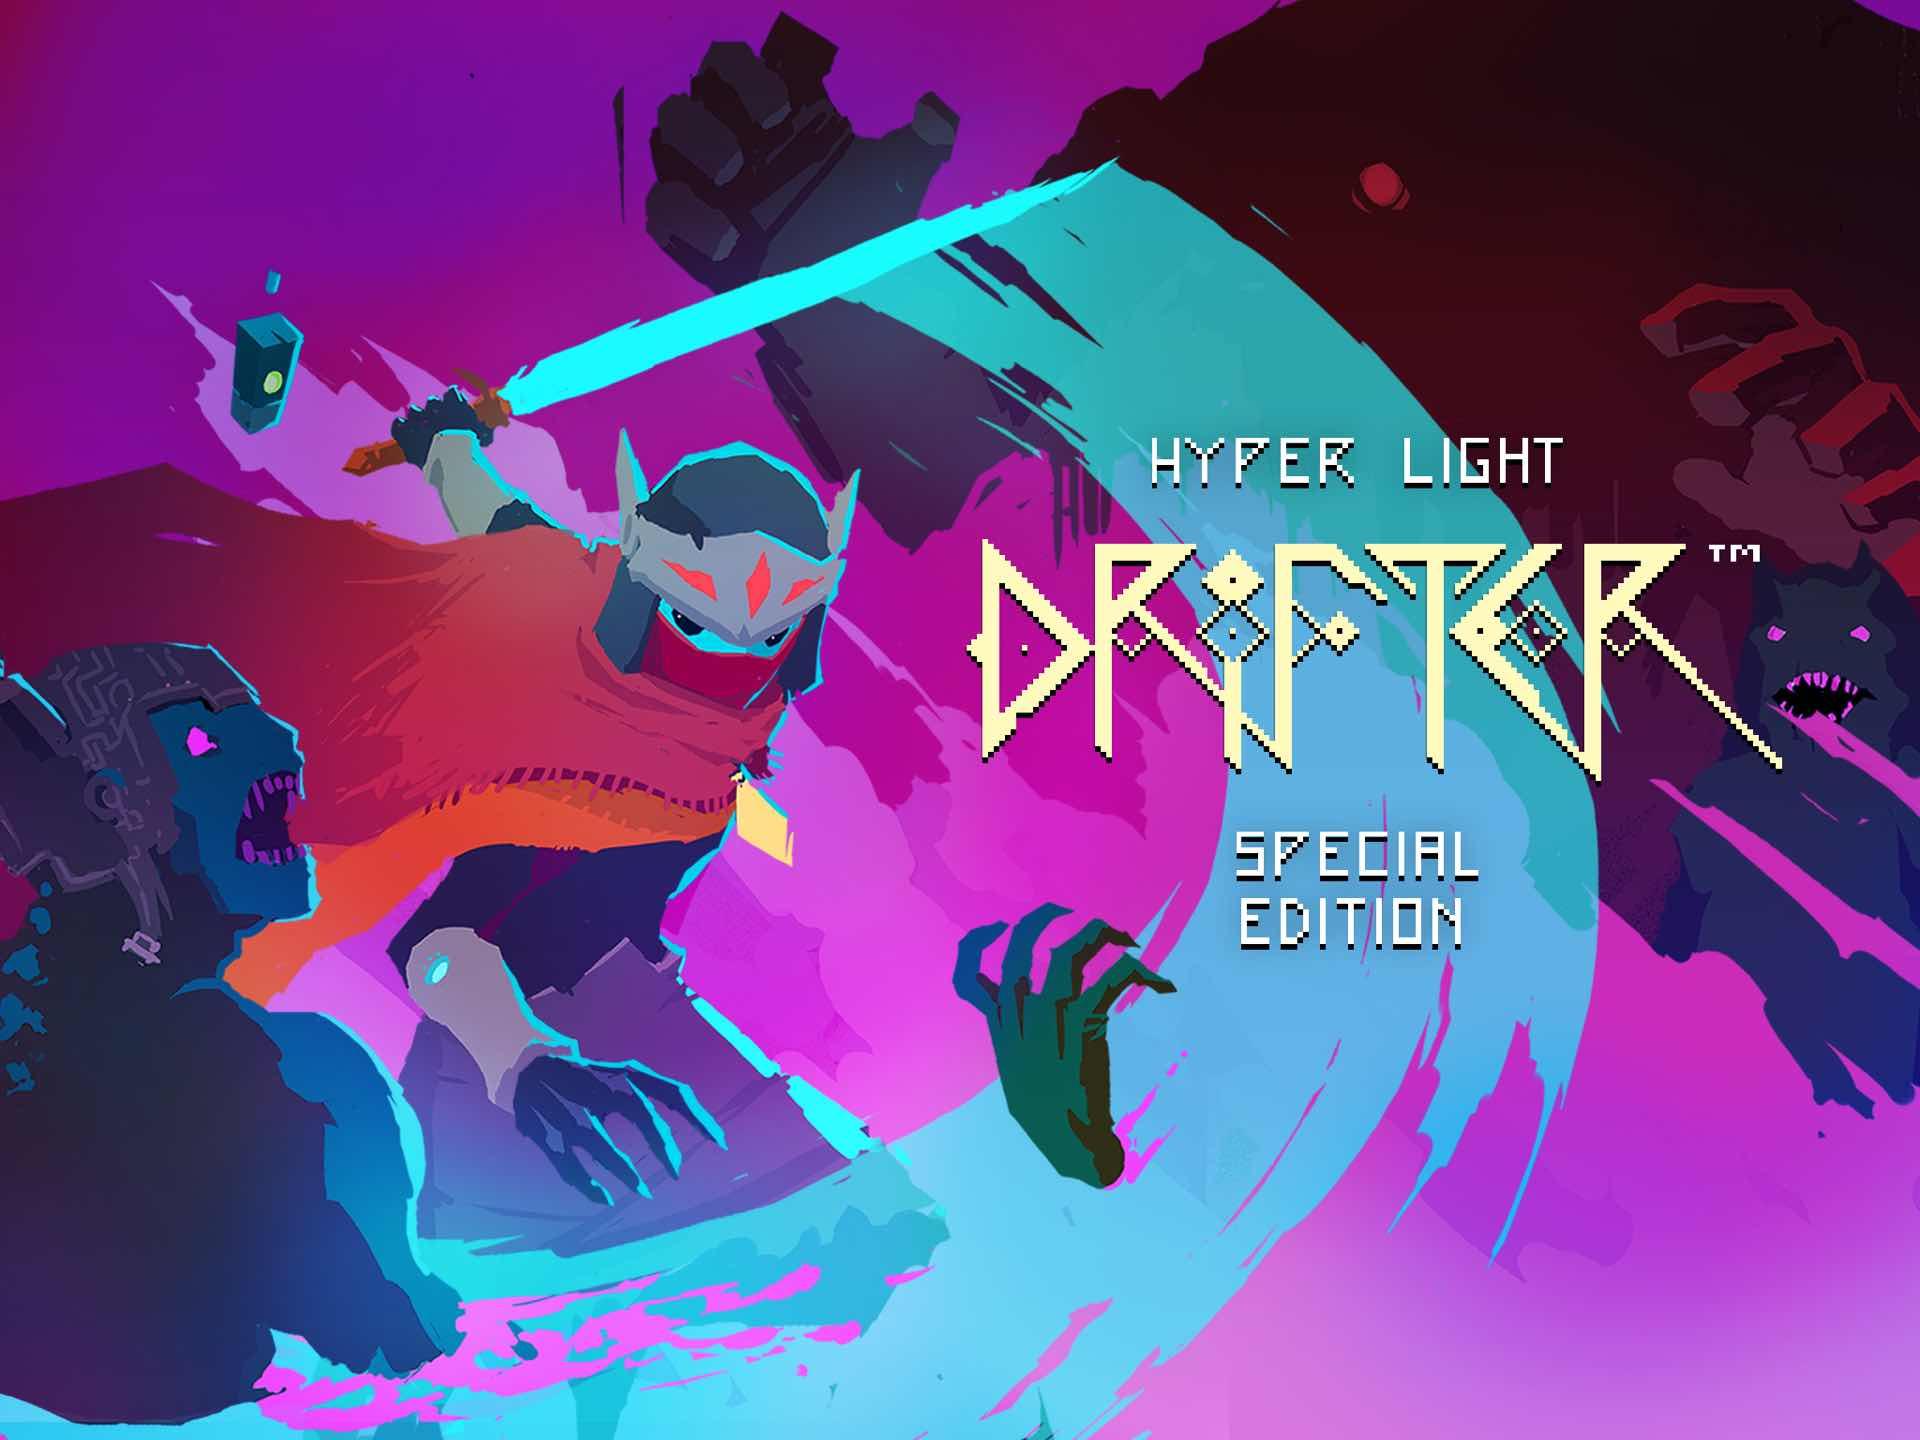 hyper-light-drifter-special-edition-for-ios